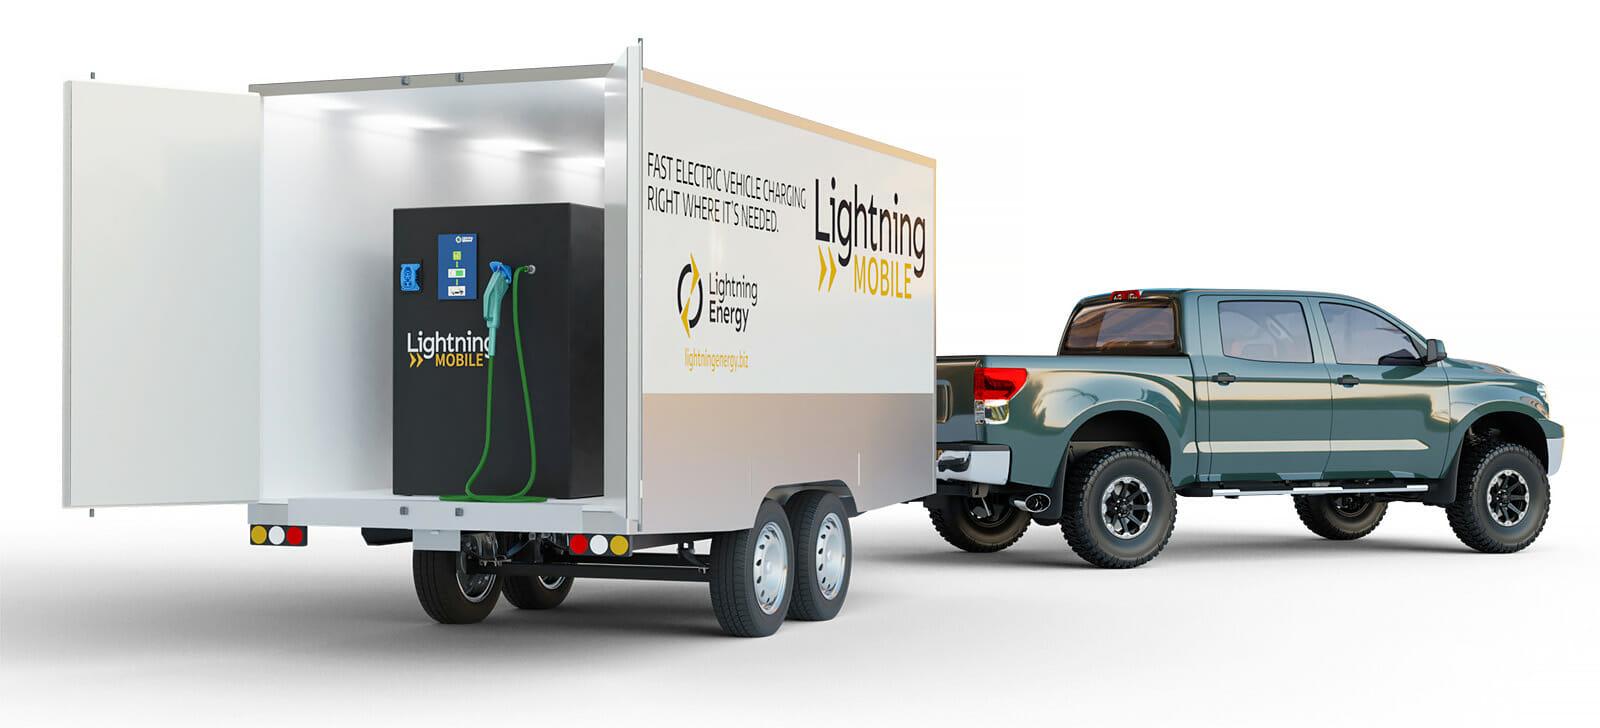 Lightning Mobile installed in a trailer